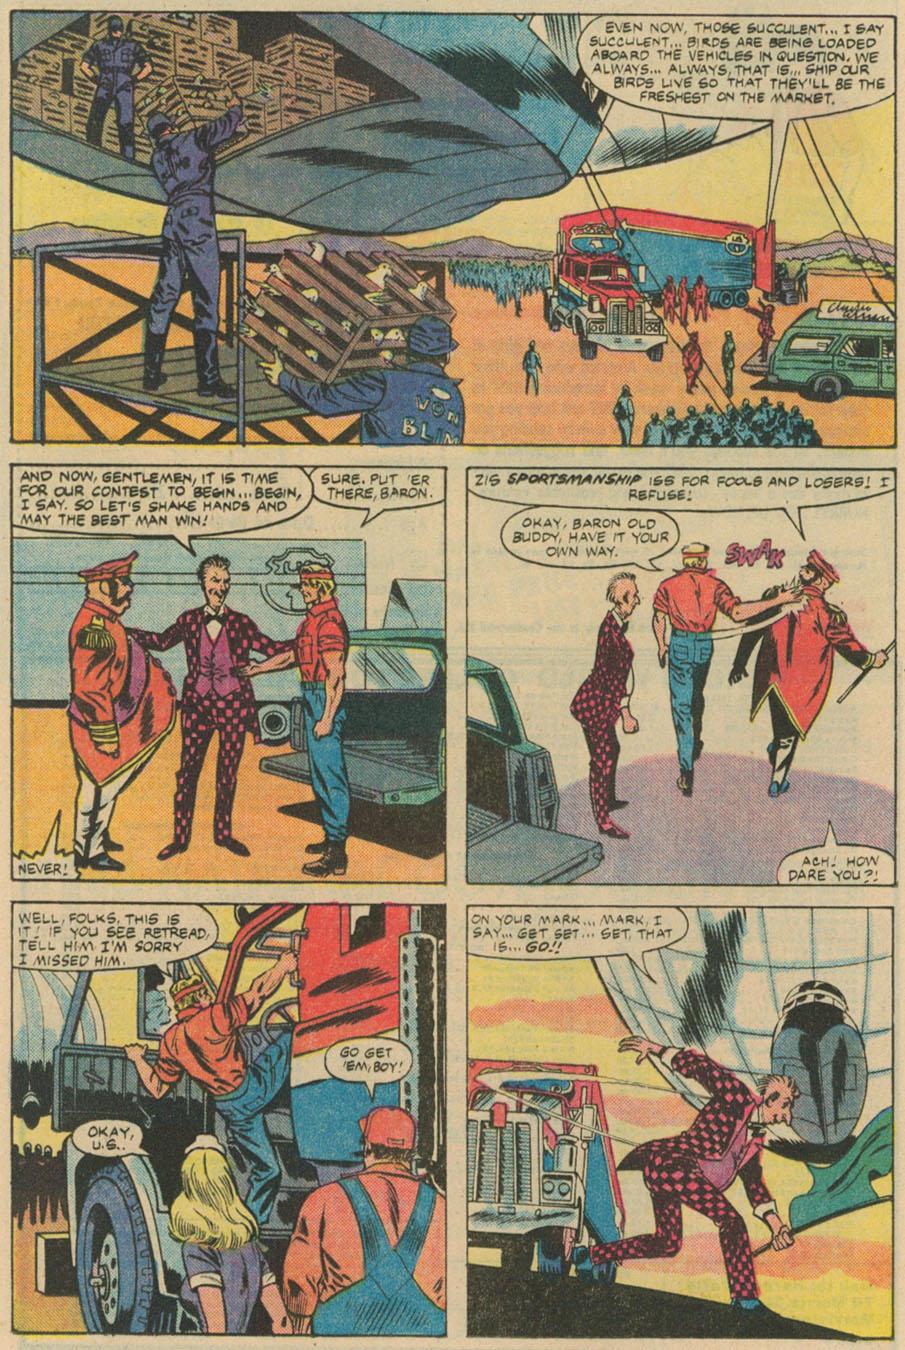 Read online U.S. 1 comic -  Issue #4 - 11